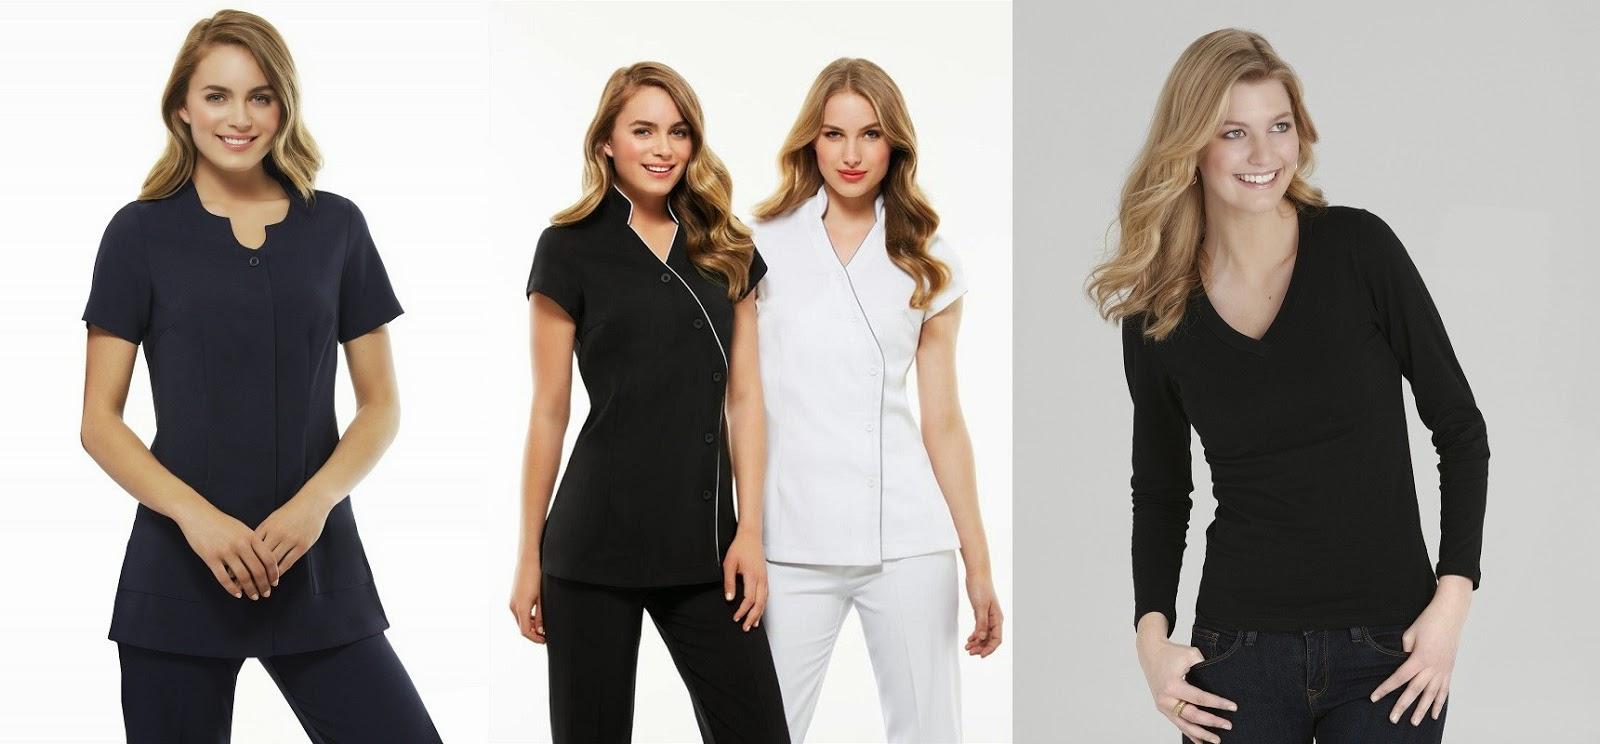 Beautician uniforms buy beautician uniforms in perth for Spa employee uniform